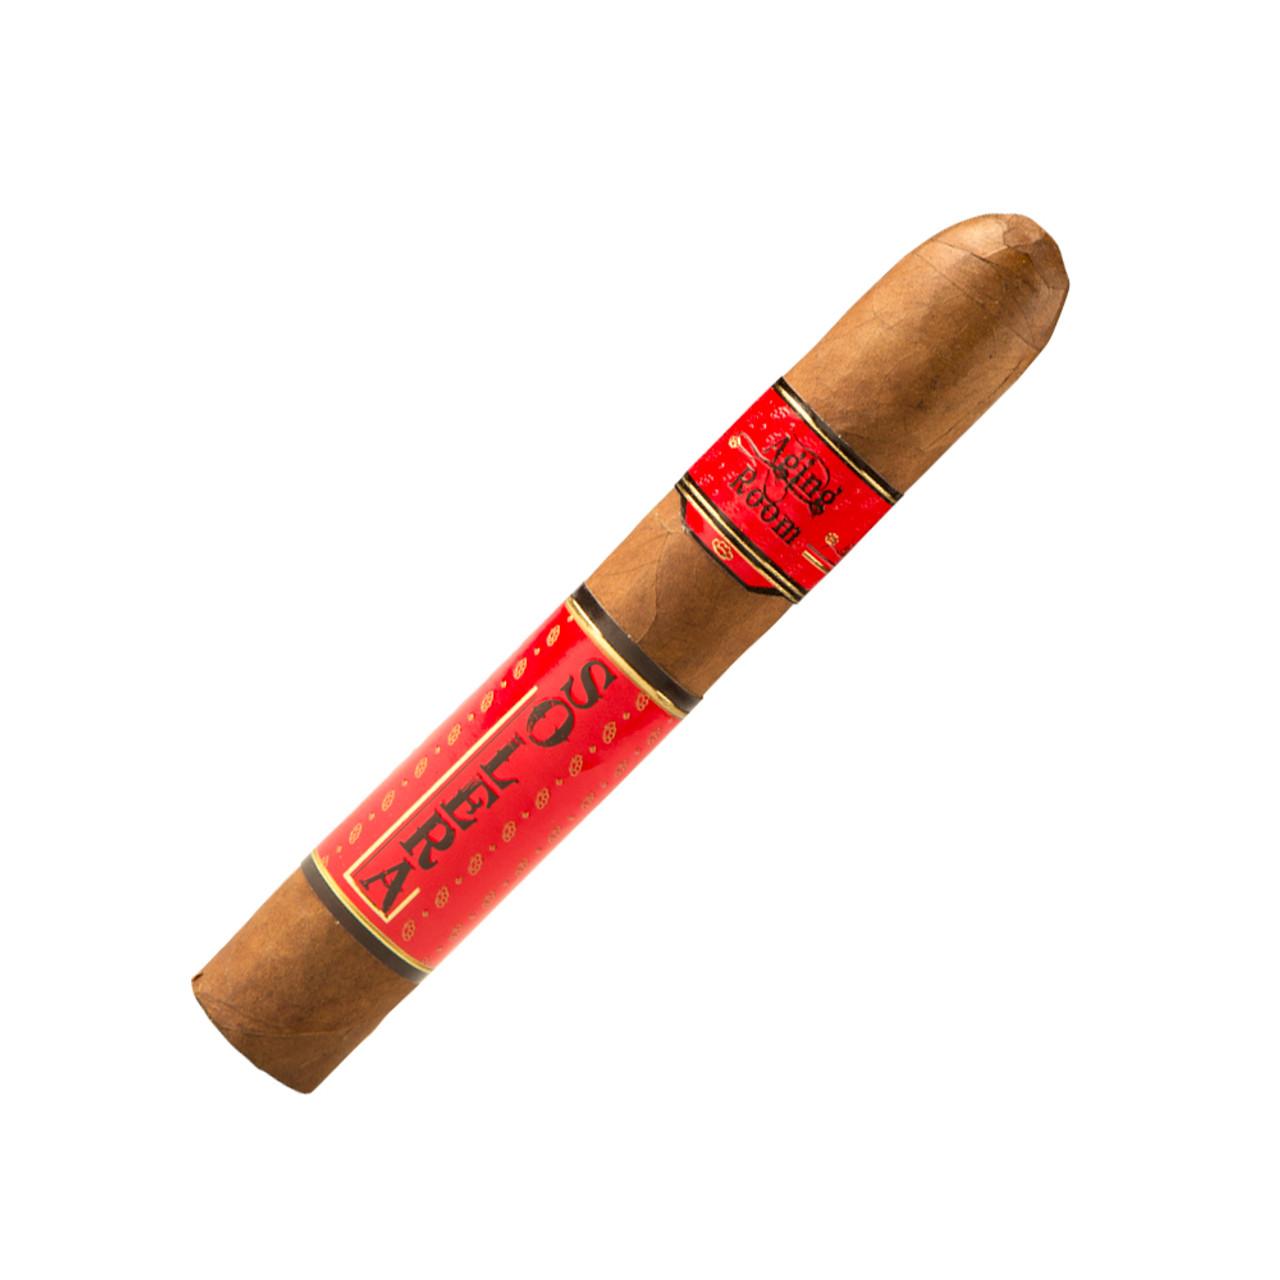 Aging Room Solera Fanfare Corojo Cigars - 6.12 x 57 (Box of 21)